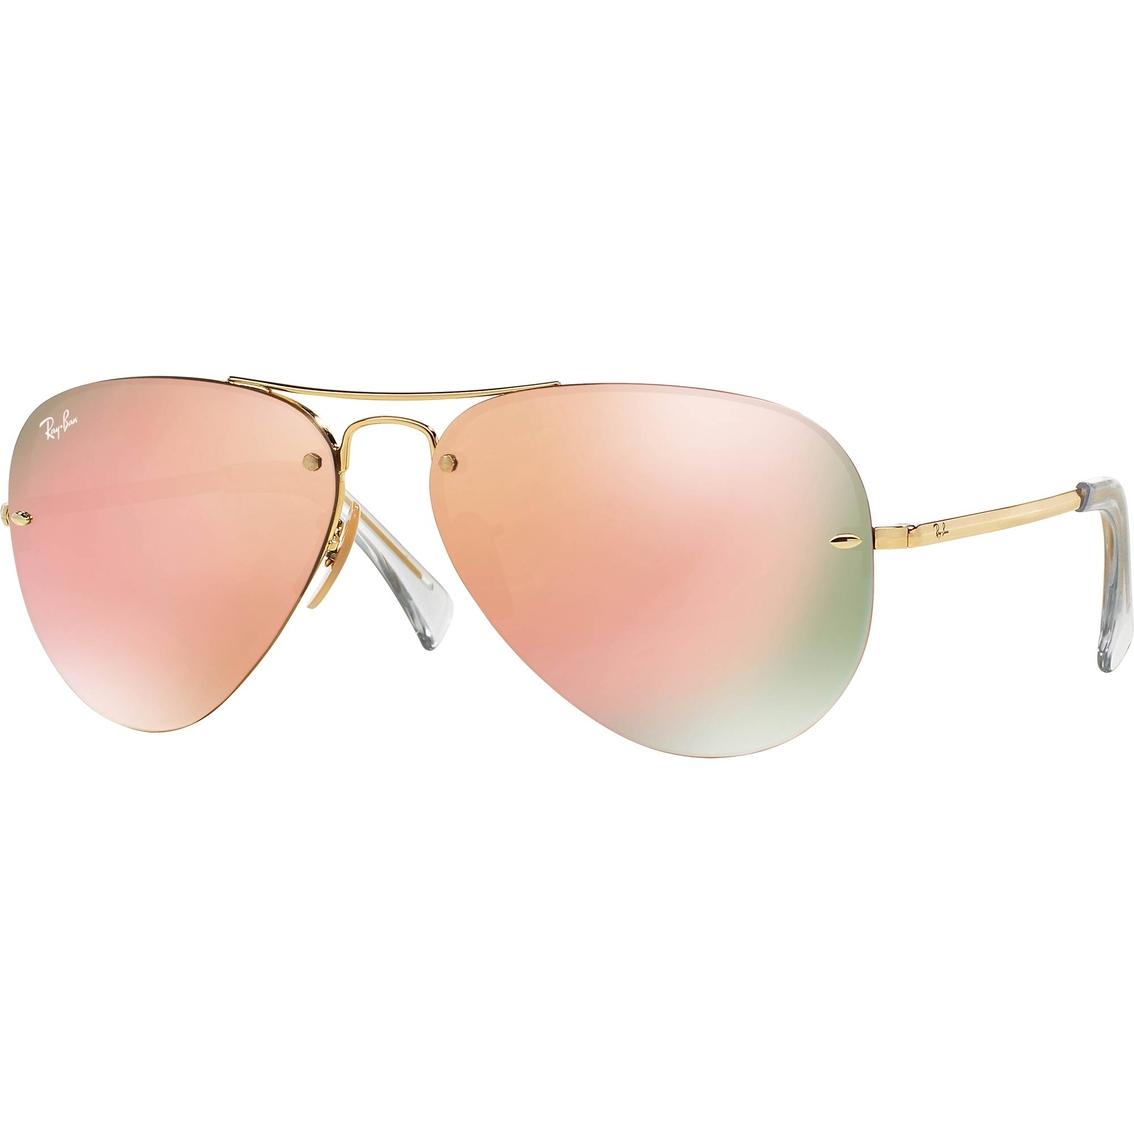 dc400f4a0c Ray-ban Semi-rimless Aviator Sunglasses 0rb3449